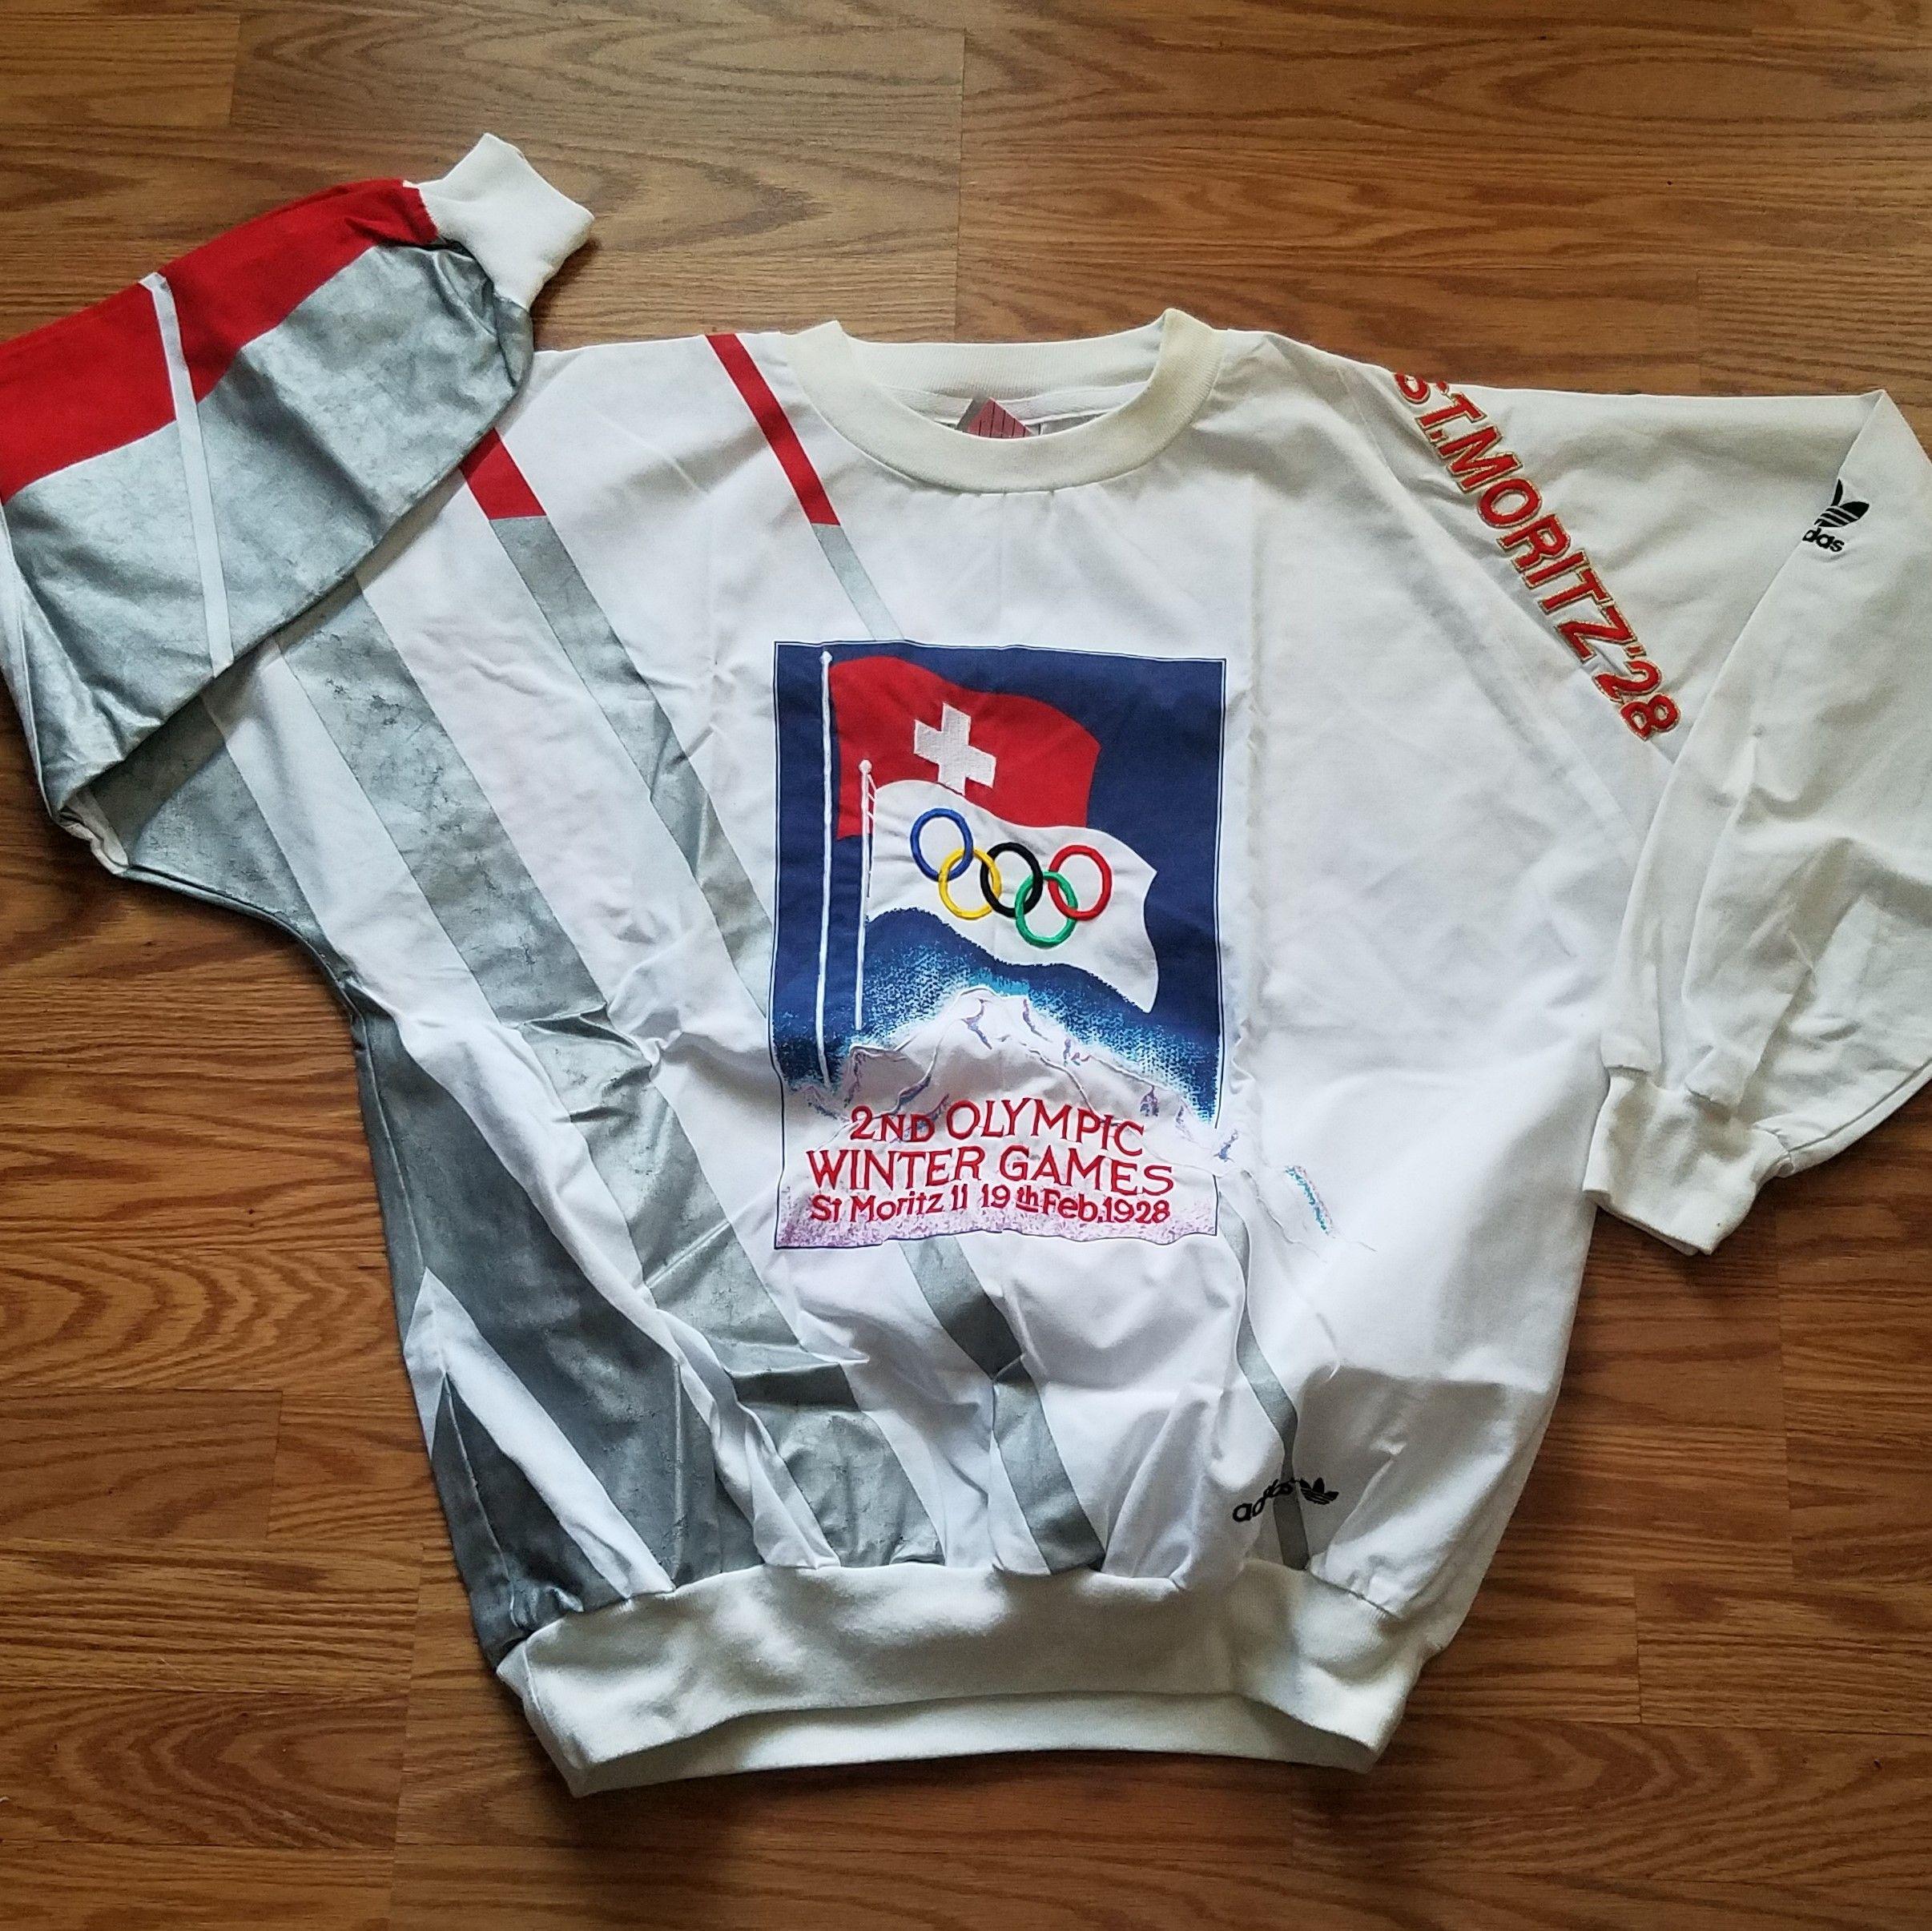 Vintage adidas dei giochi olimpici invernali moritz crewneck felpa